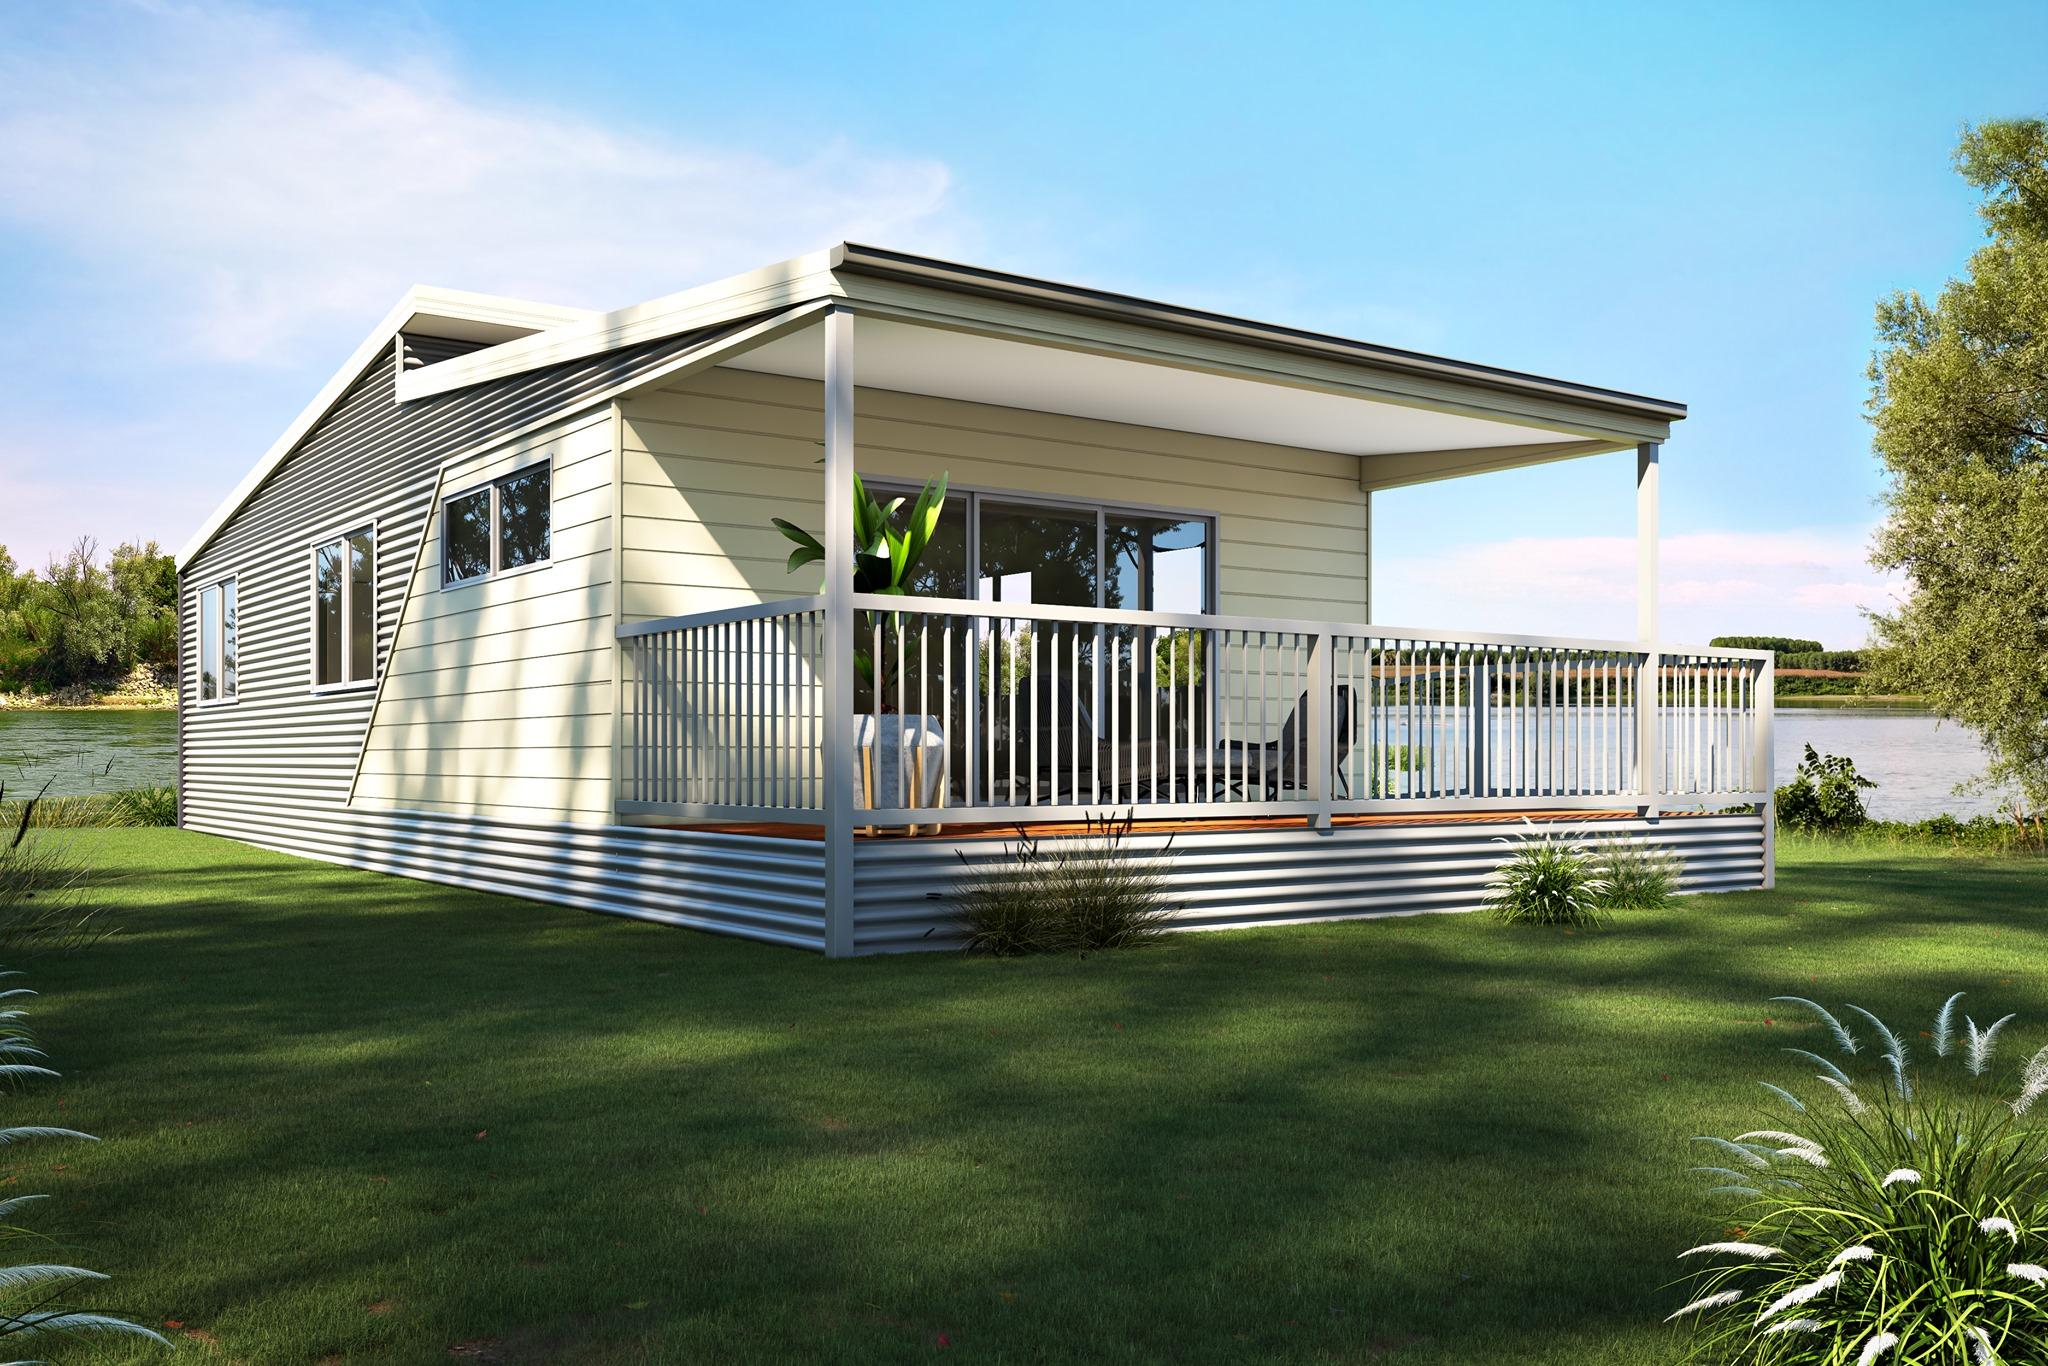 Riverbend Caravan Park 8-person cabin, artist impression